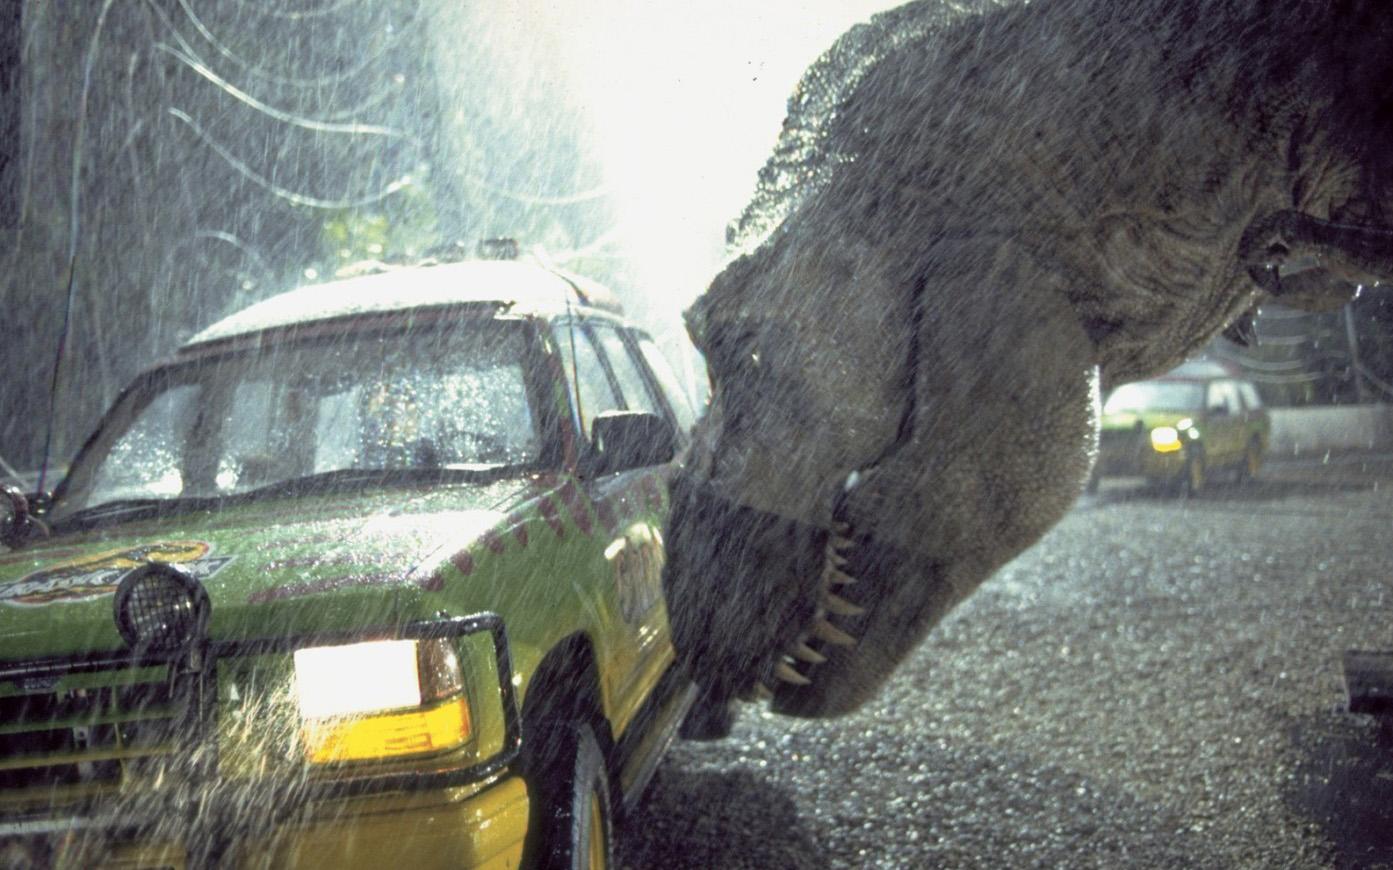 Jurassic Park - T-Rex